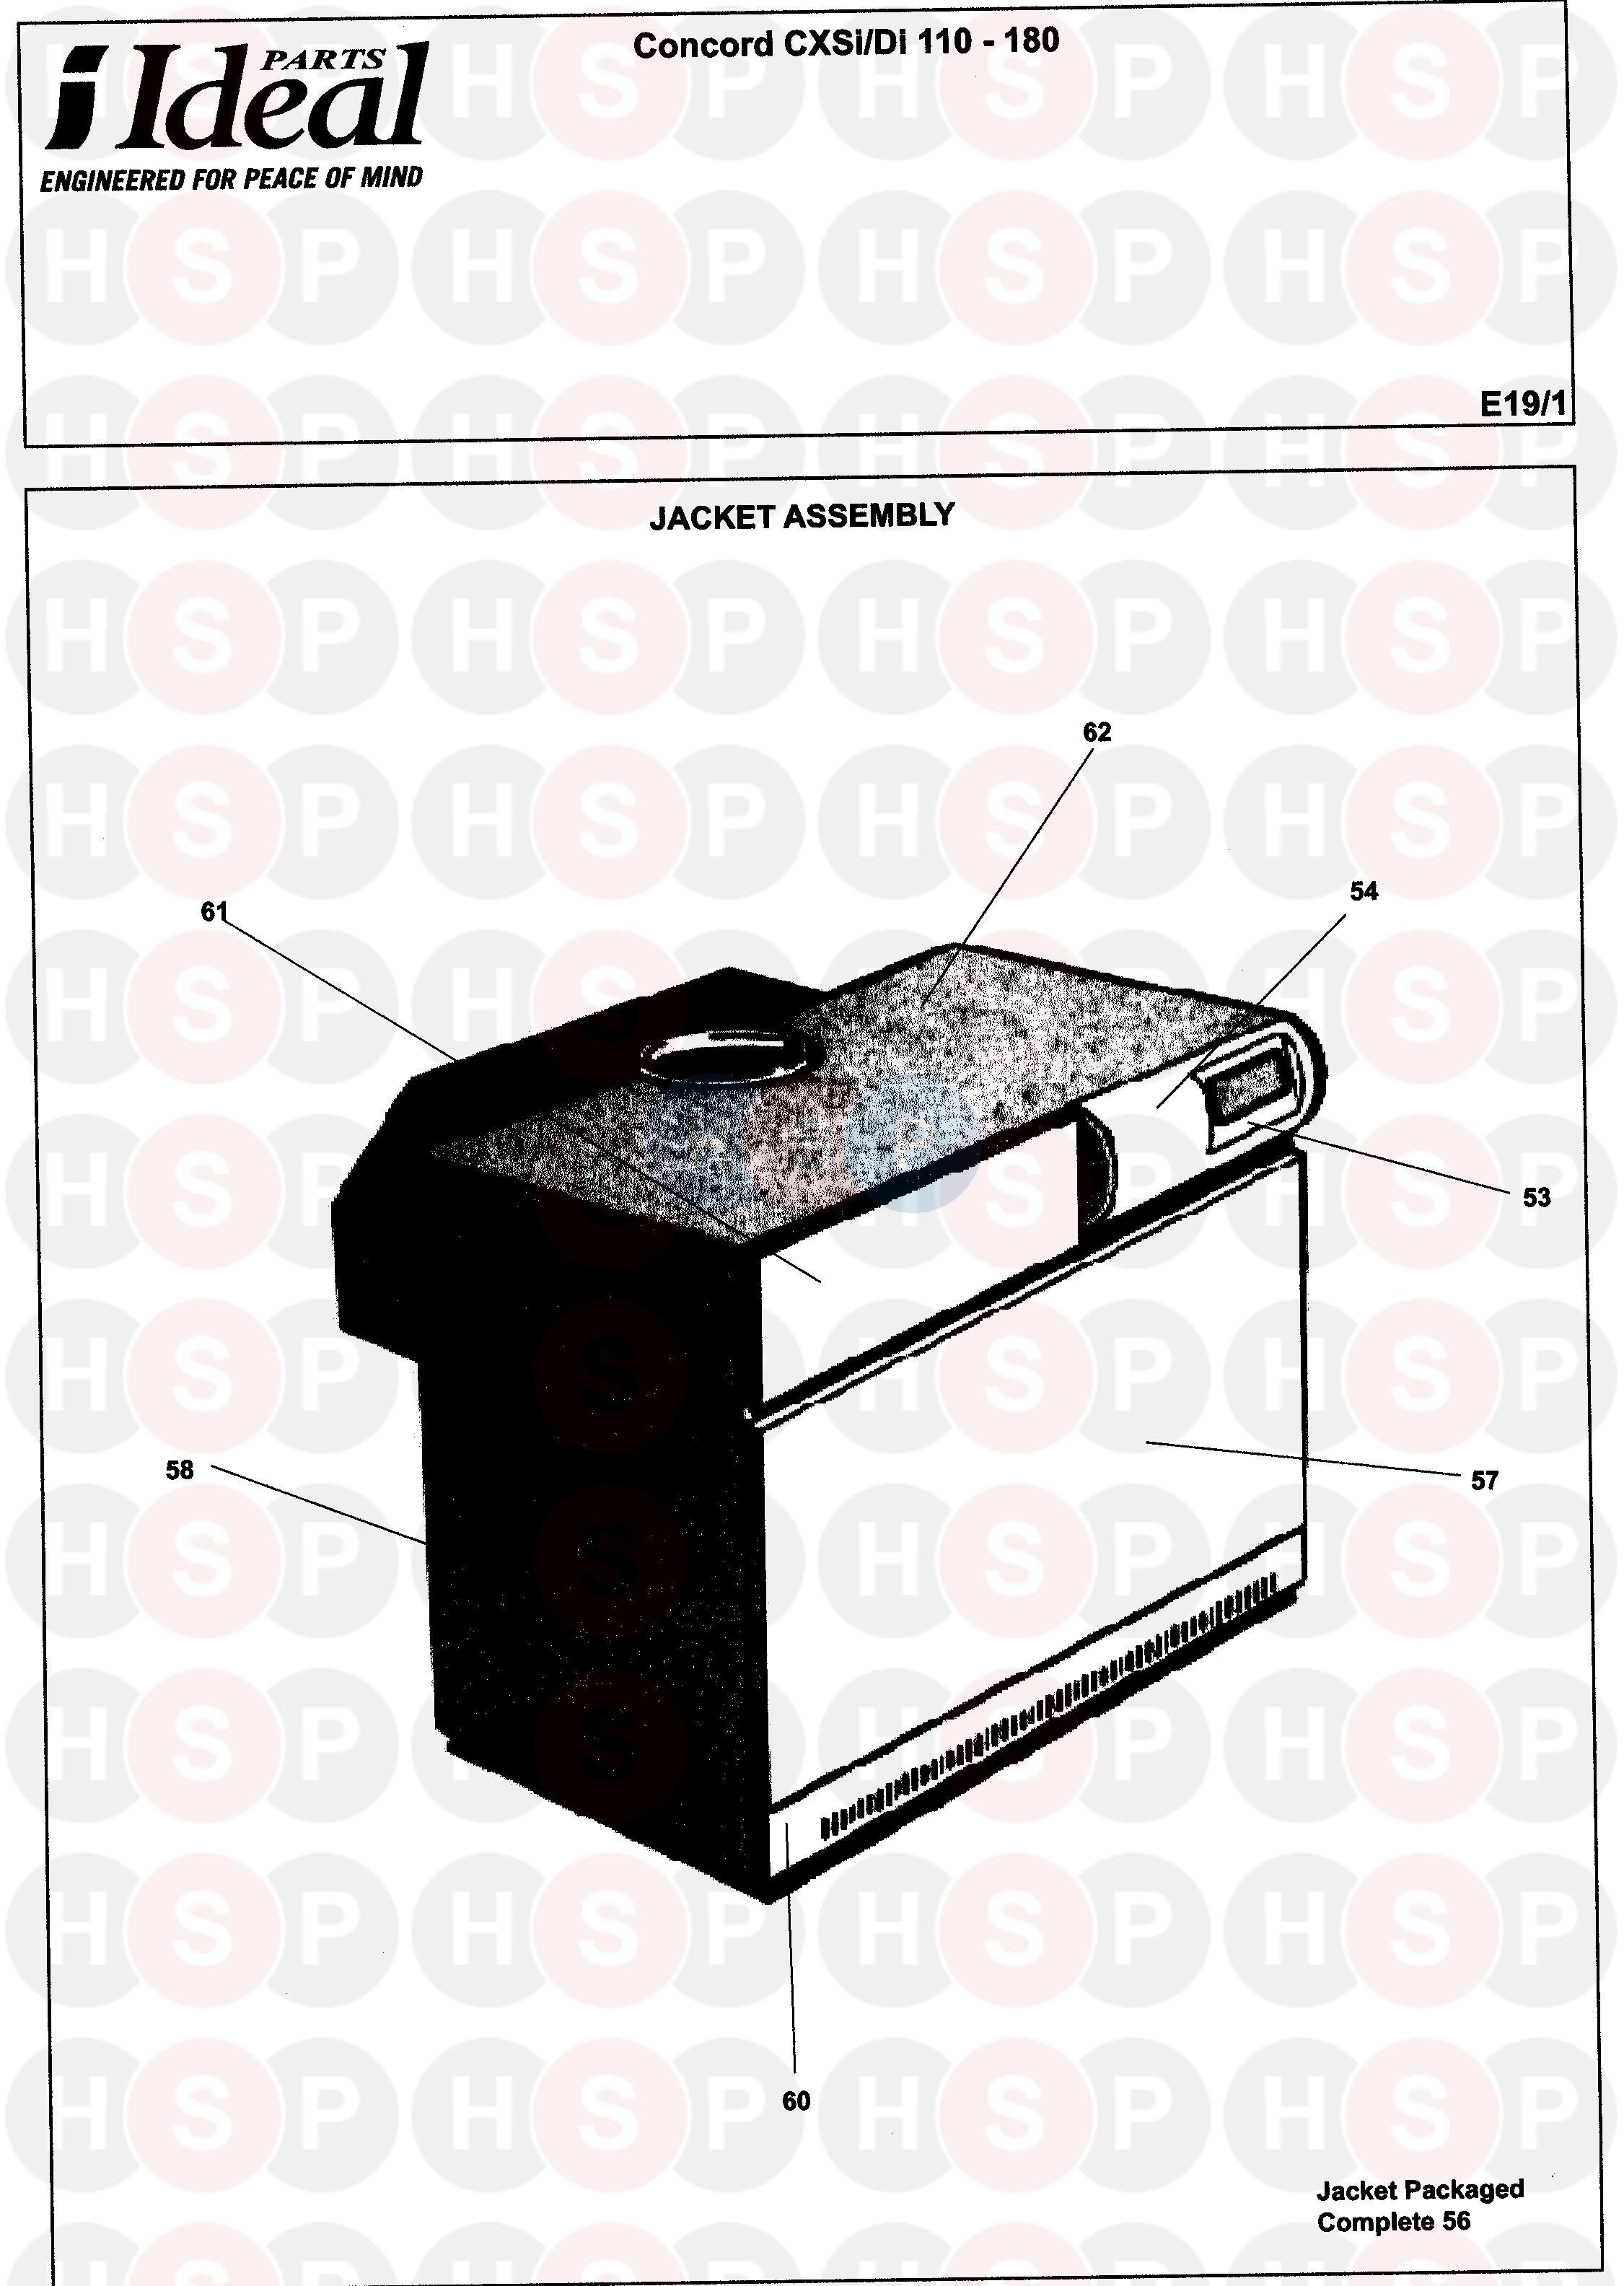 ideal concord cxsi 110 180 appliance diagram appliance. Black Bedroom Furniture Sets. Home Design Ideas